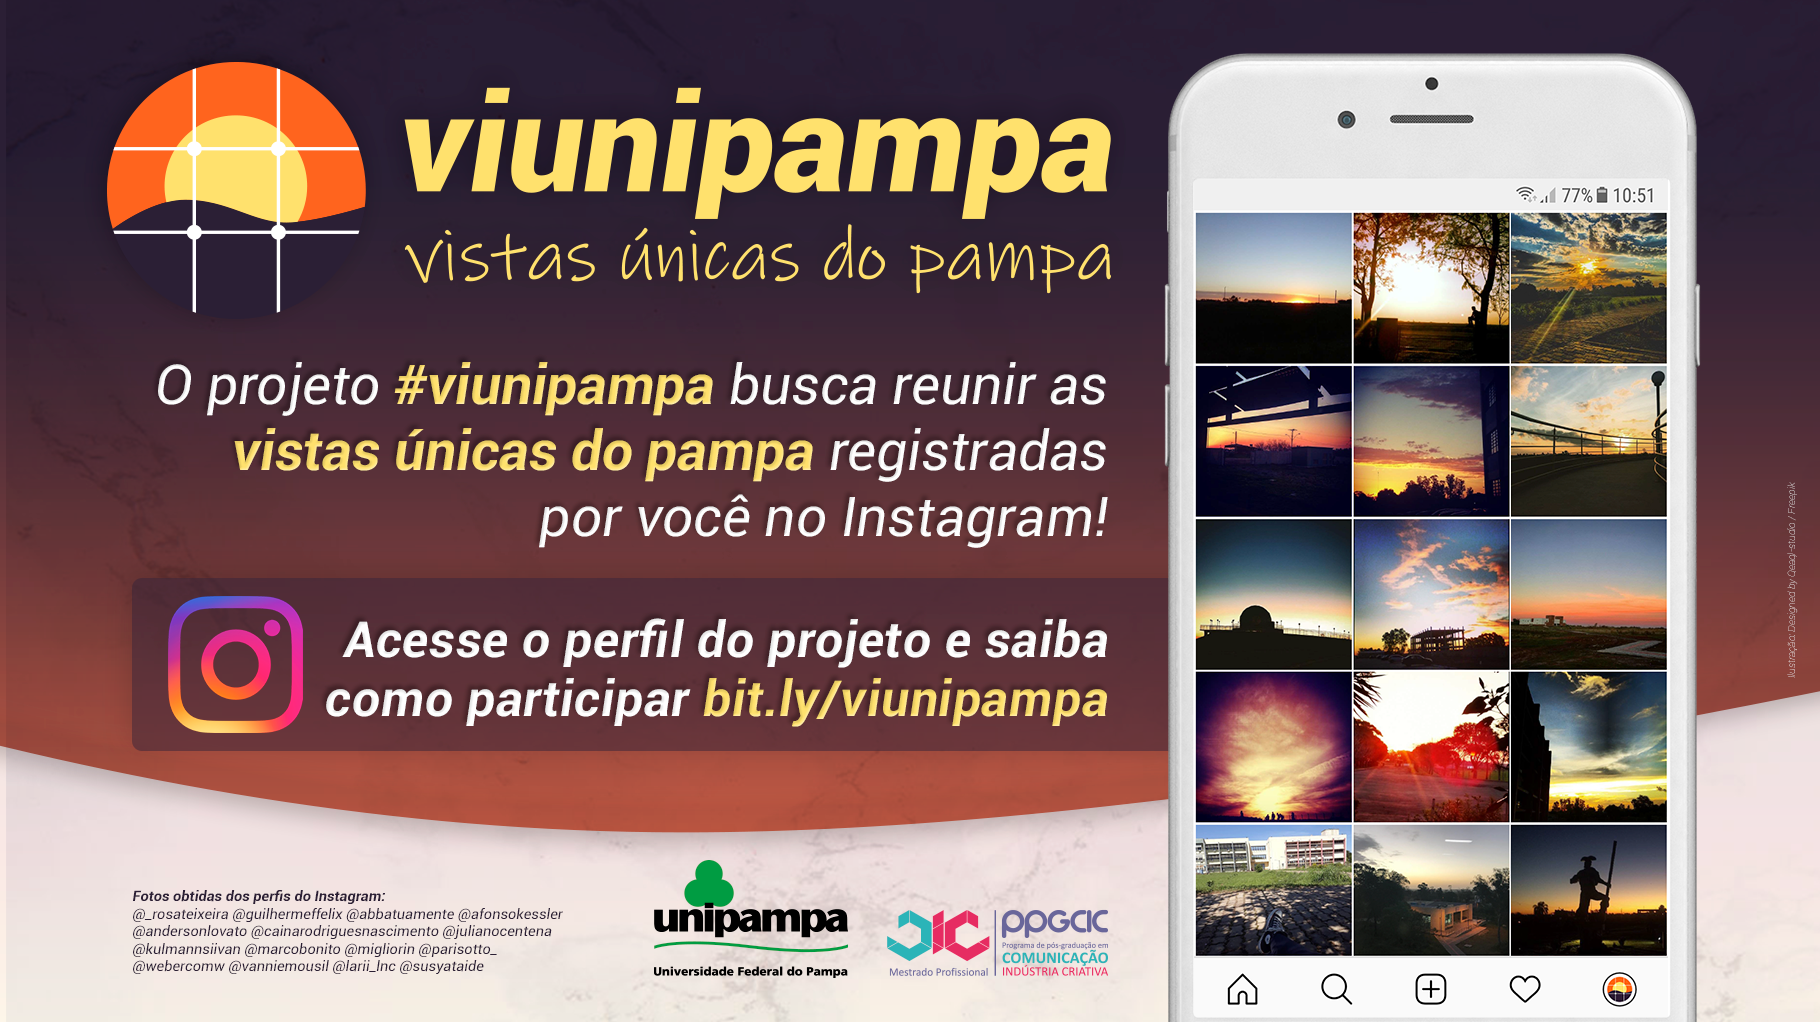 Projeto #viunipampa